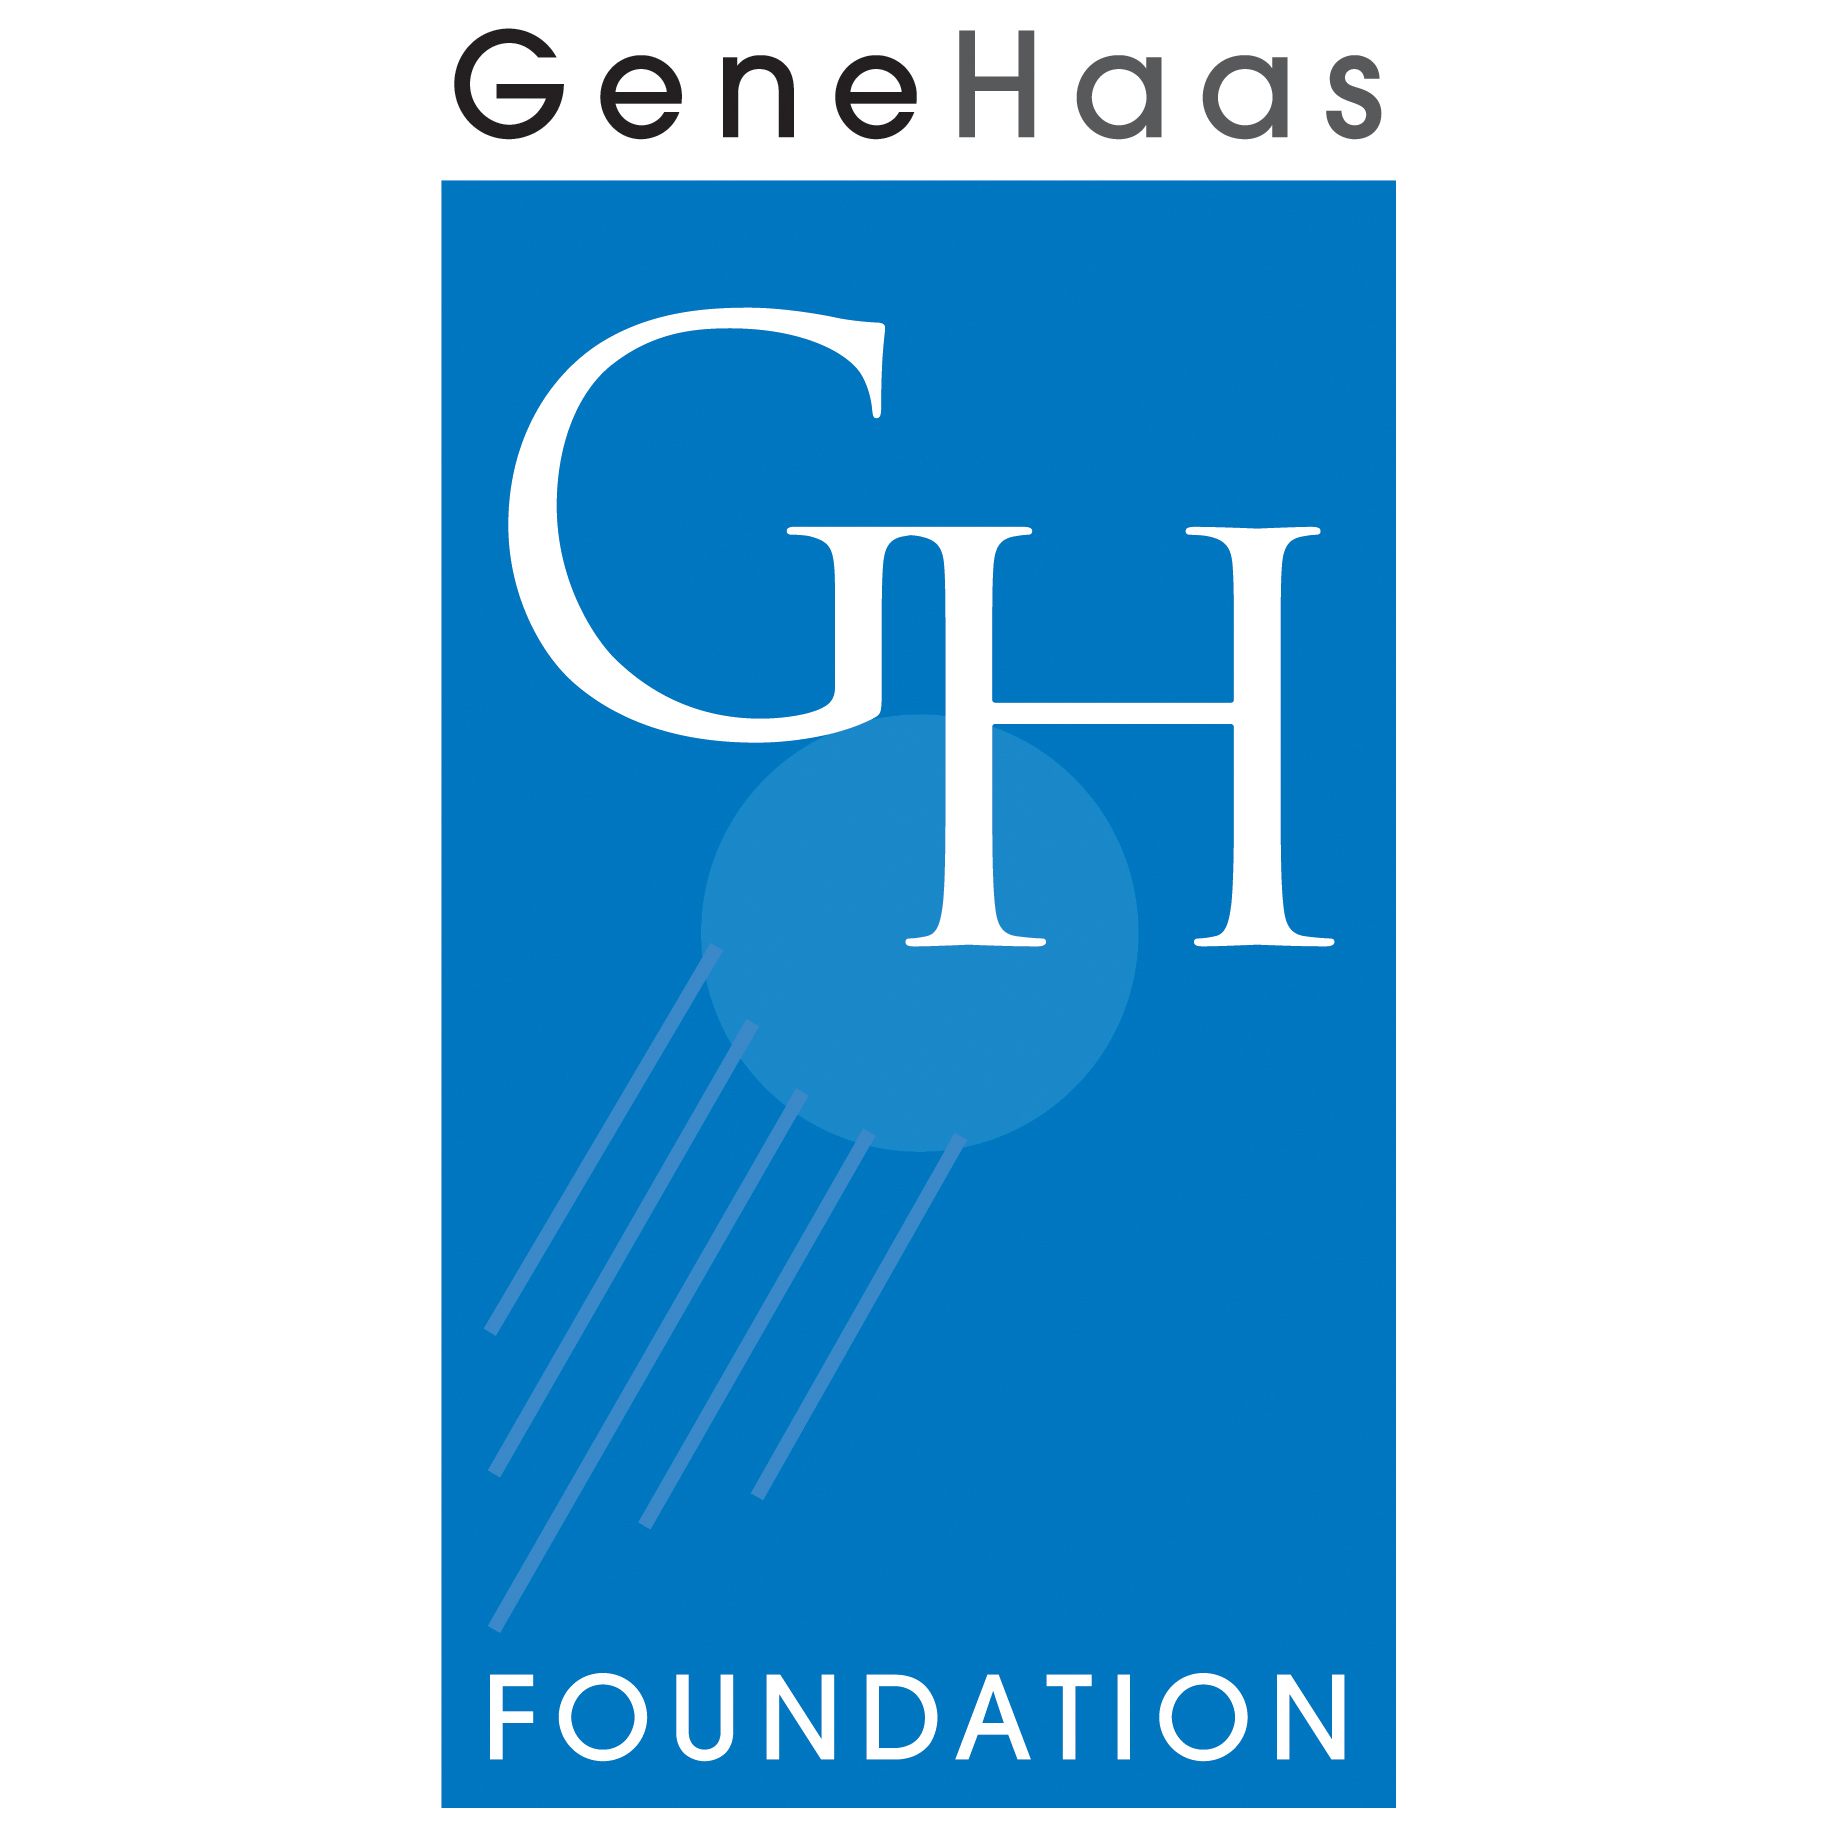 STEM_GH_FoundationLogo.jpg